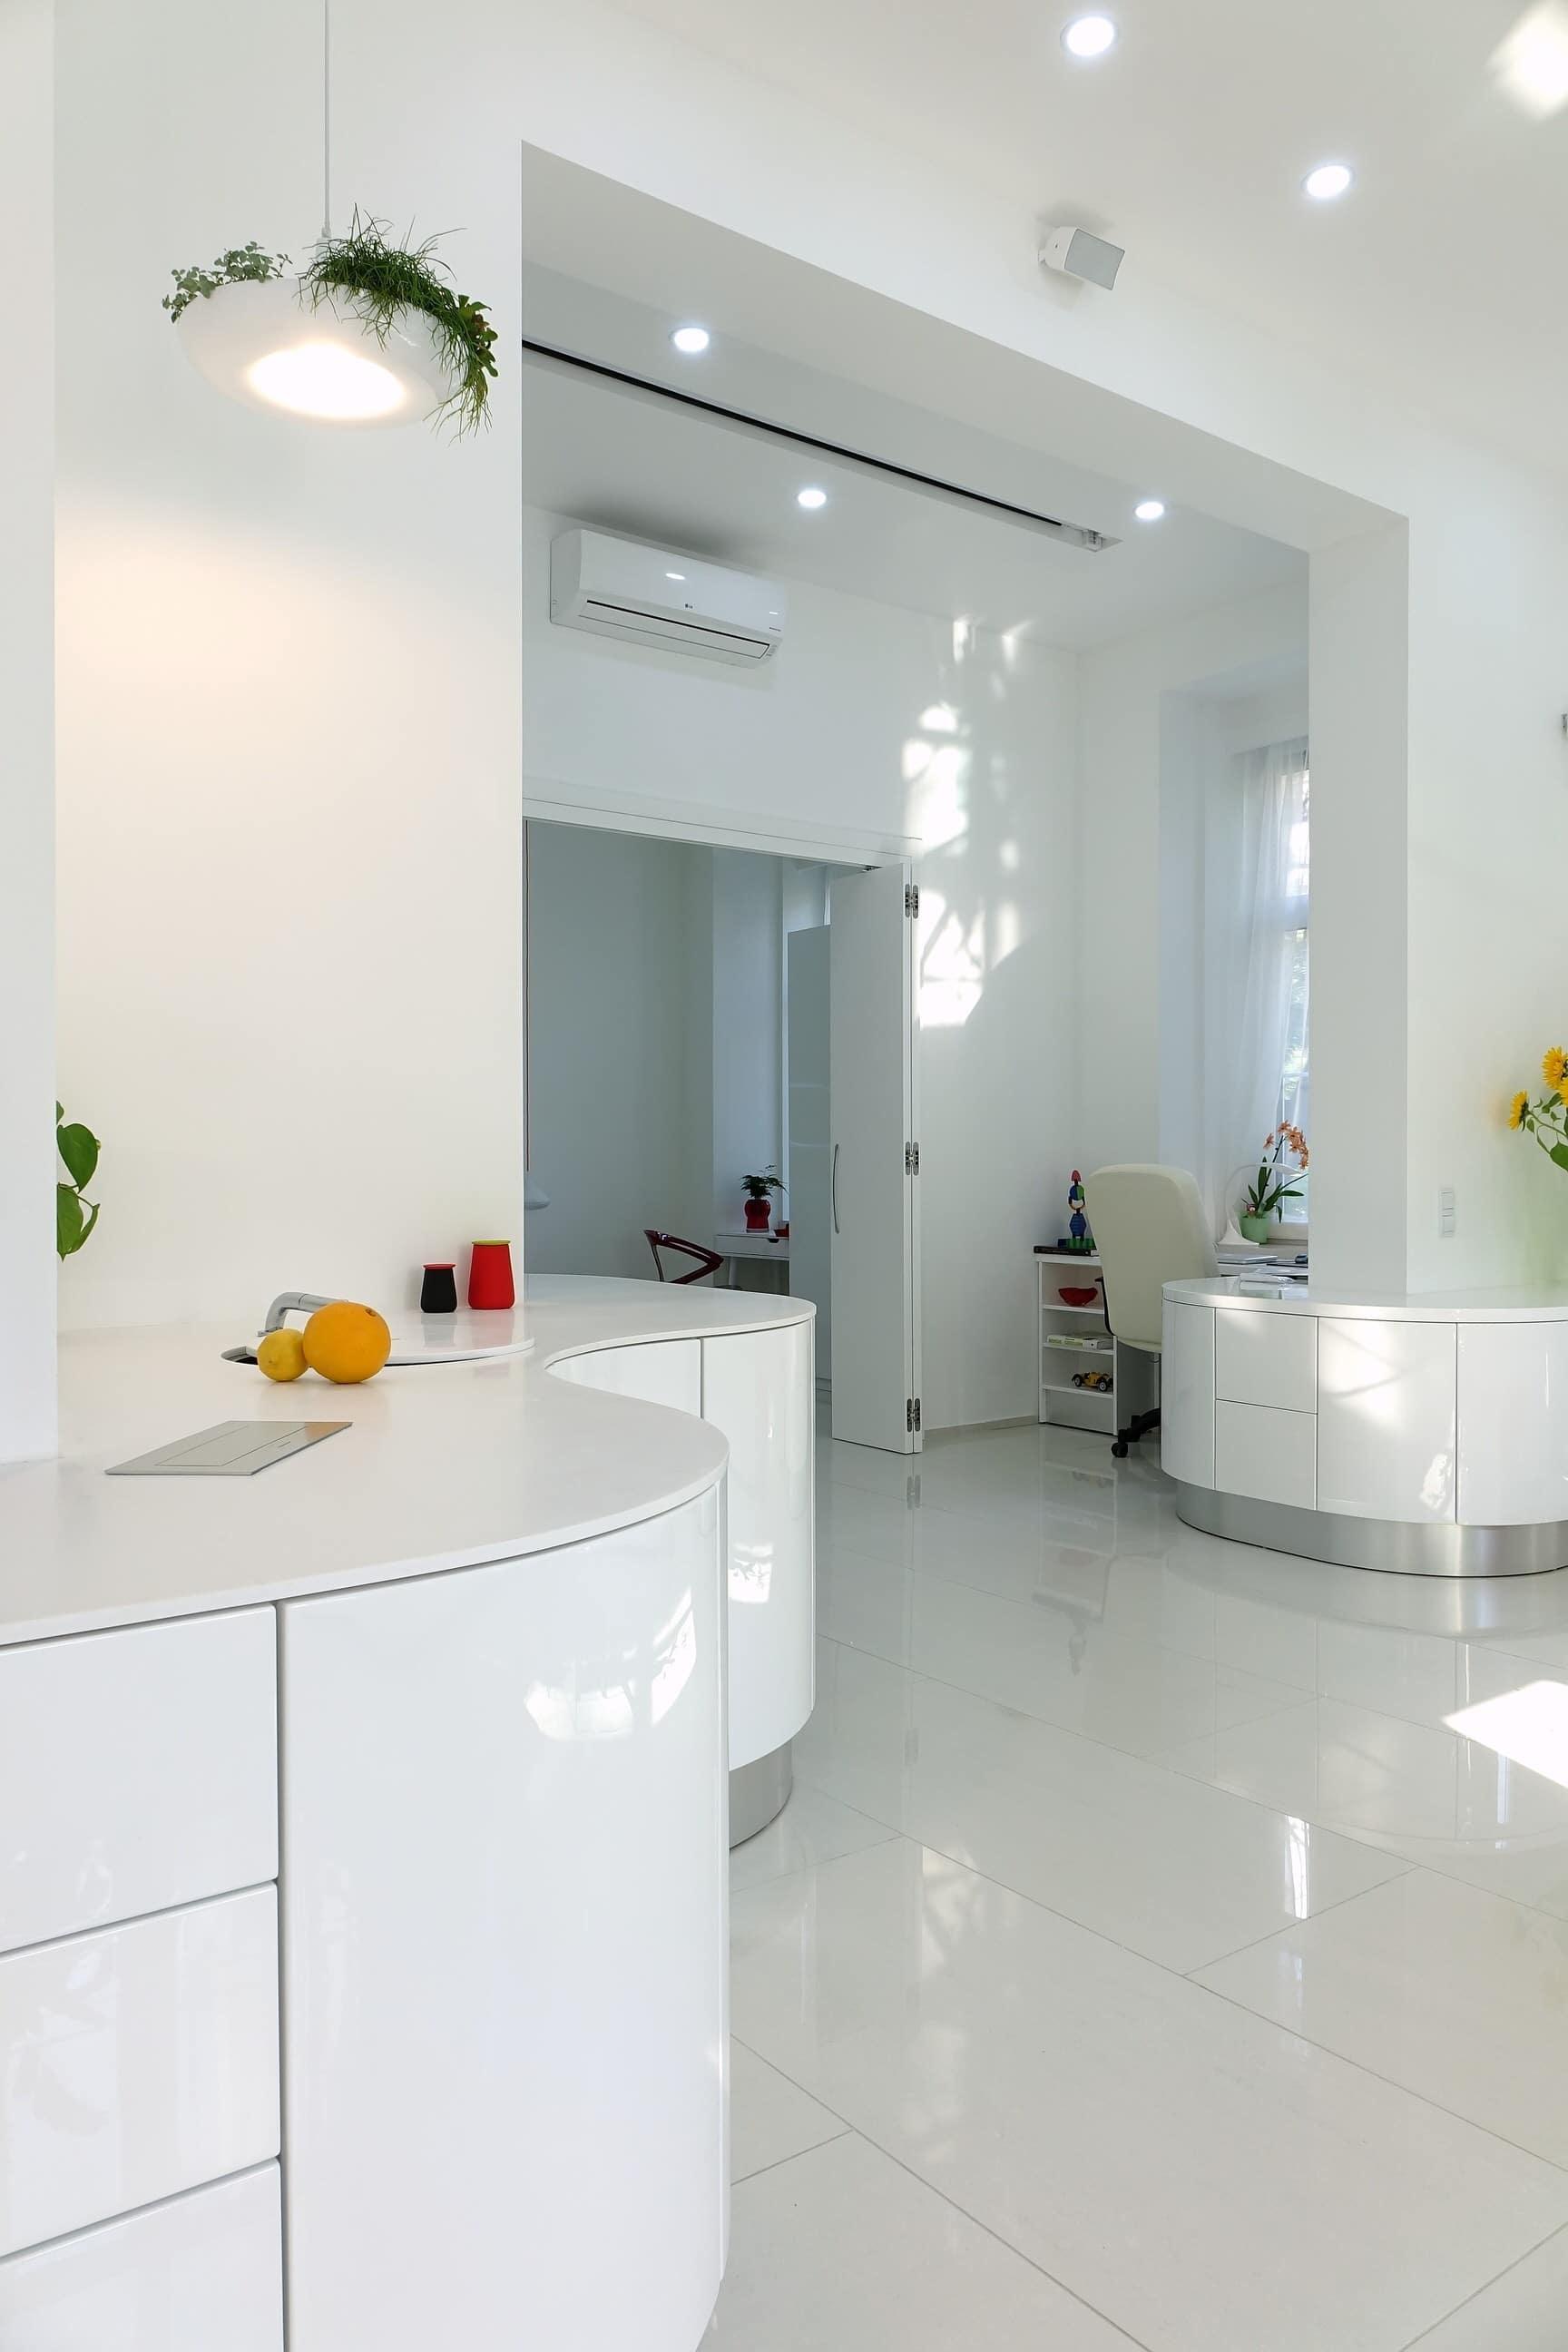 halasz-utca-modern-design-apartment-budapest-dsc00237_filtered_01